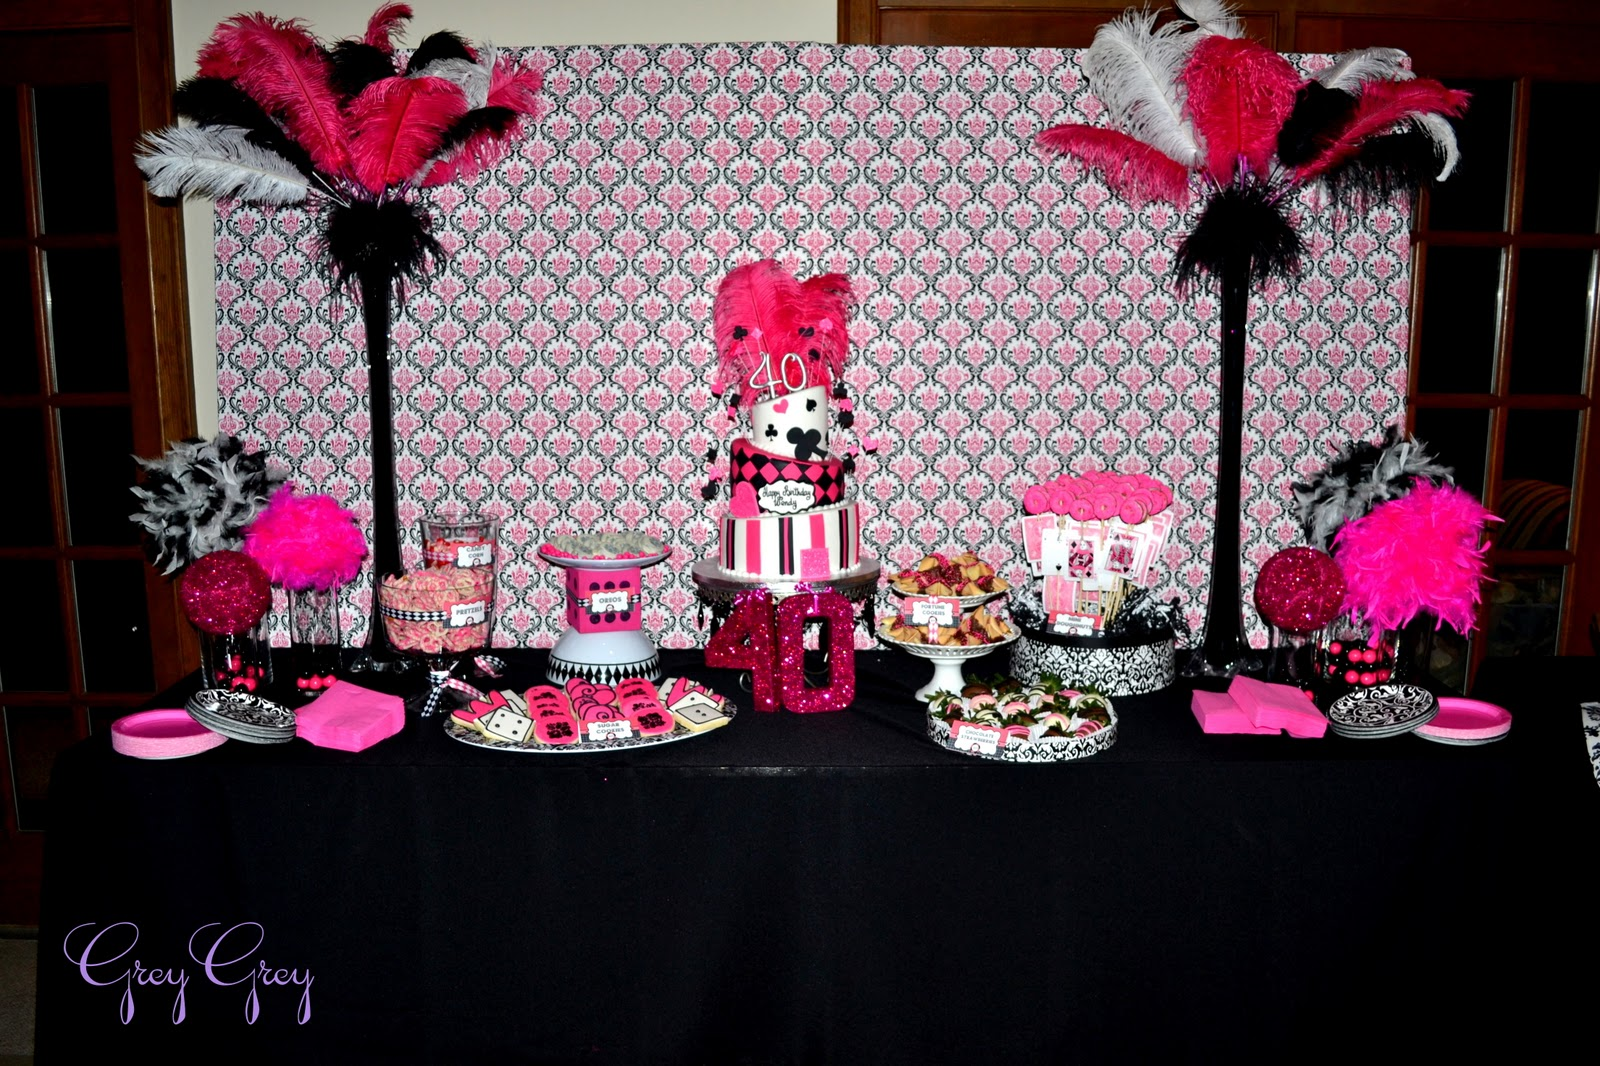 GreyGrey Designs: {My Parties} Hot Pink Glamorous Casino